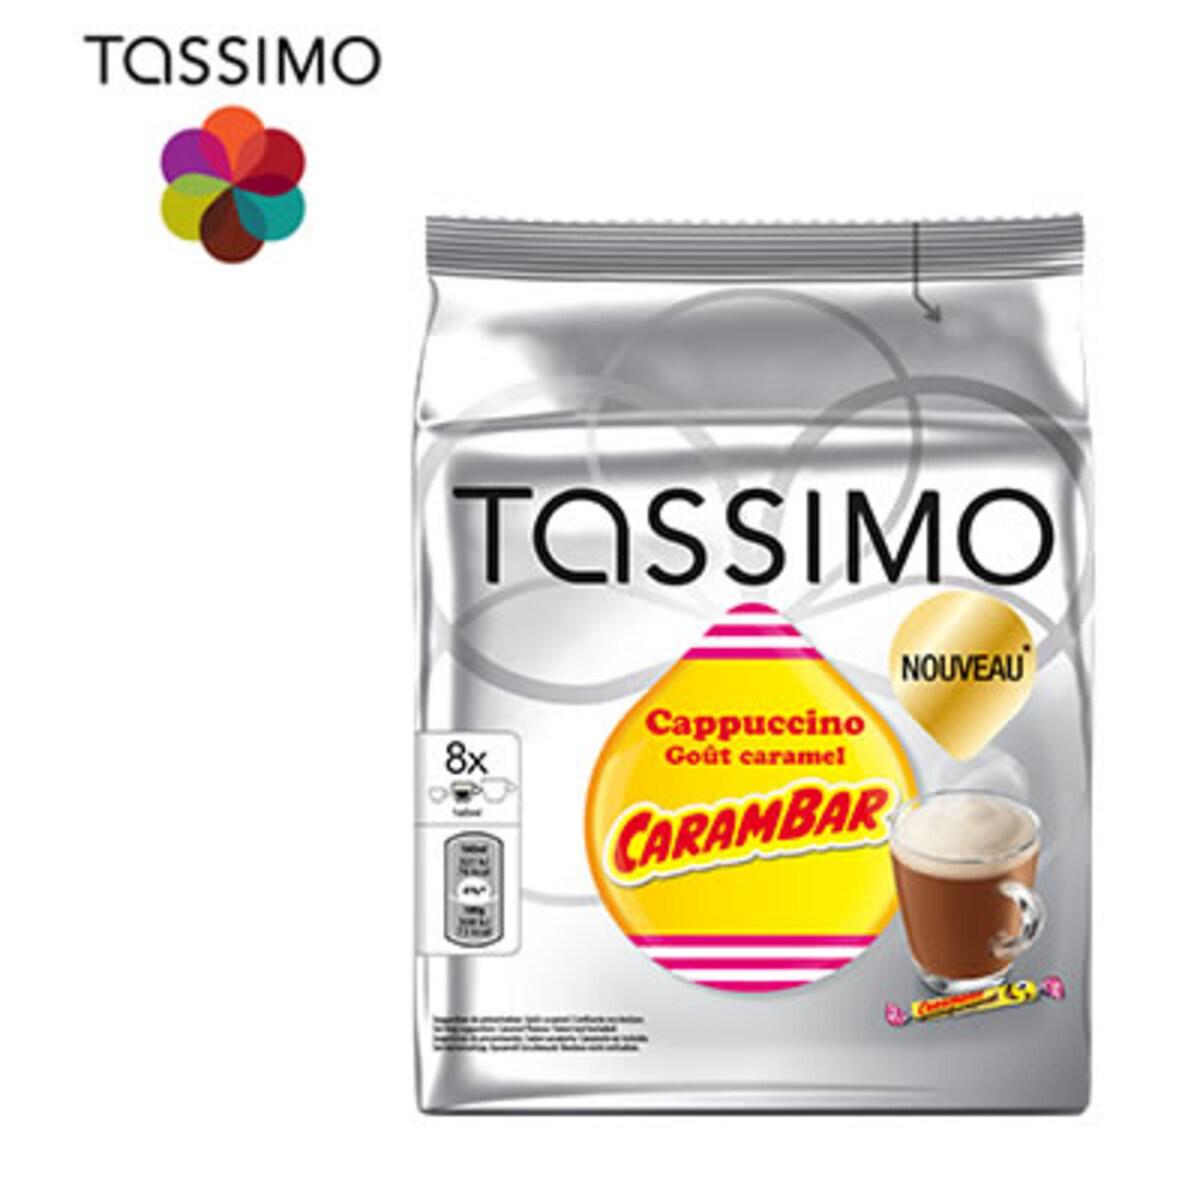 Tassimo Carambar Cappuccino